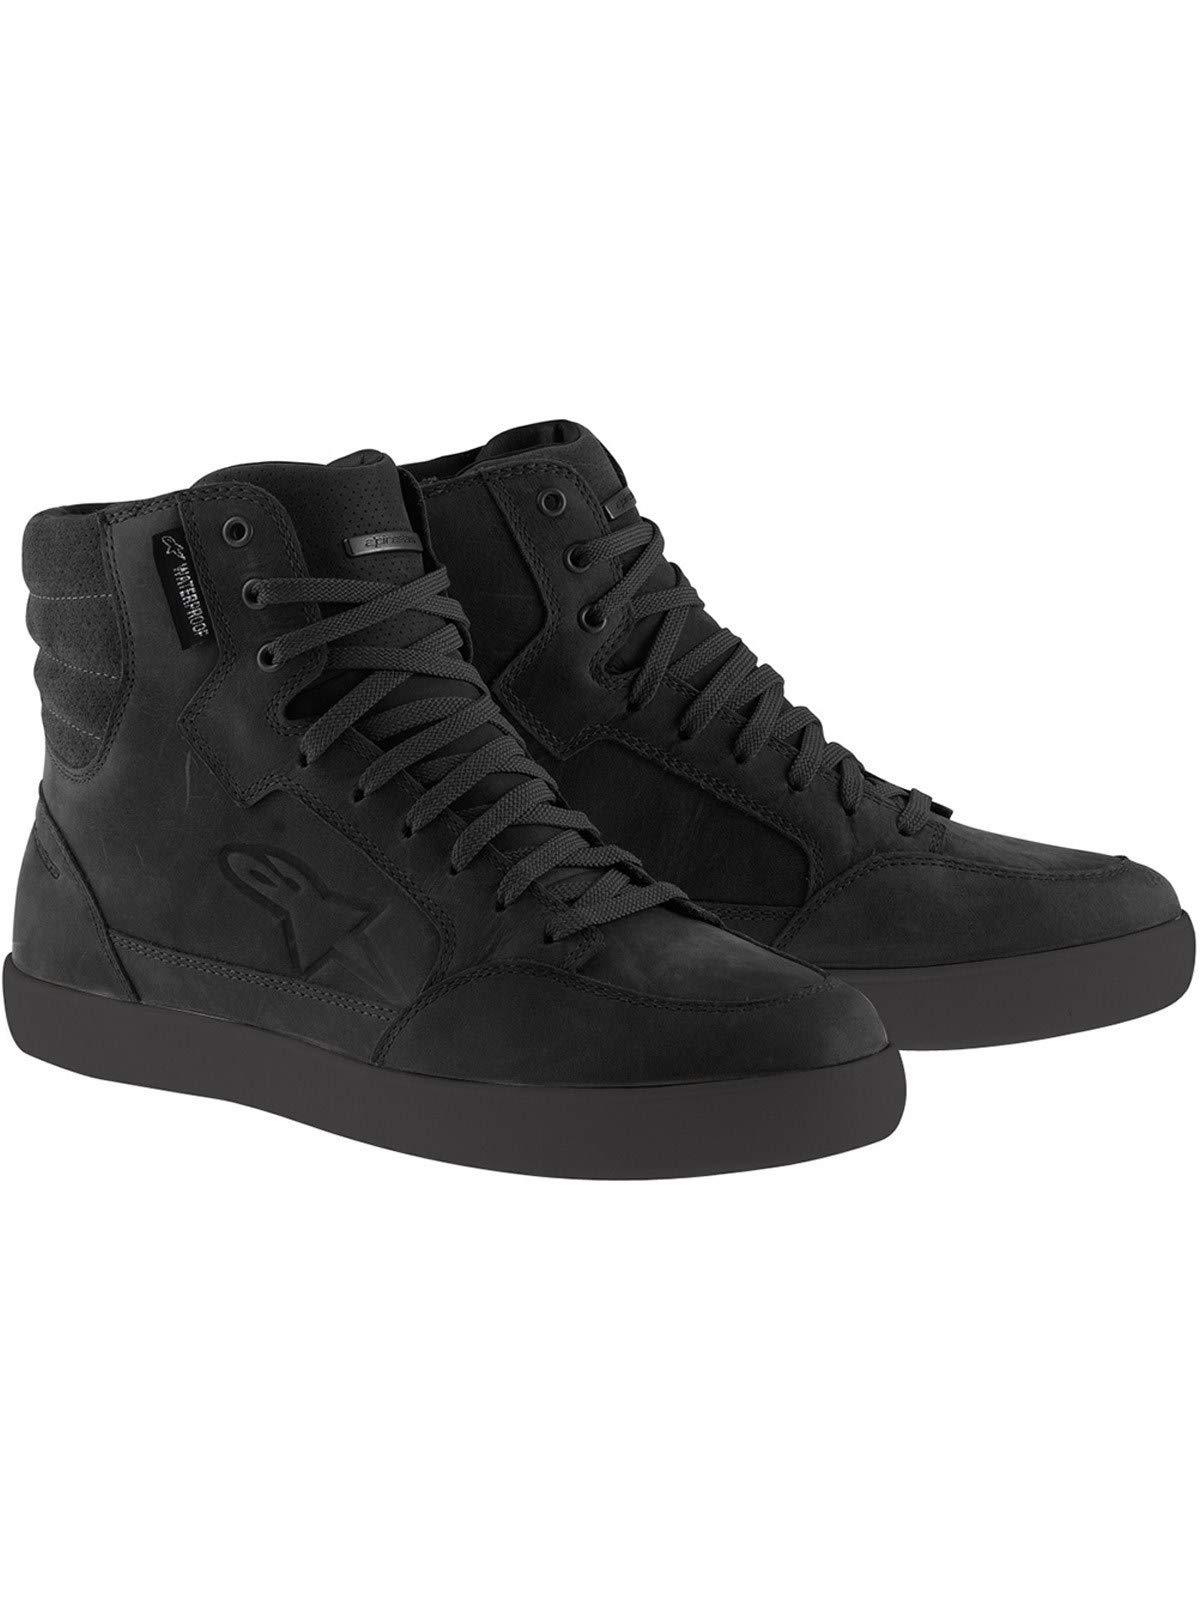 Alpinestars J-6 Waterproof Shoes-Black-12.5 (US)